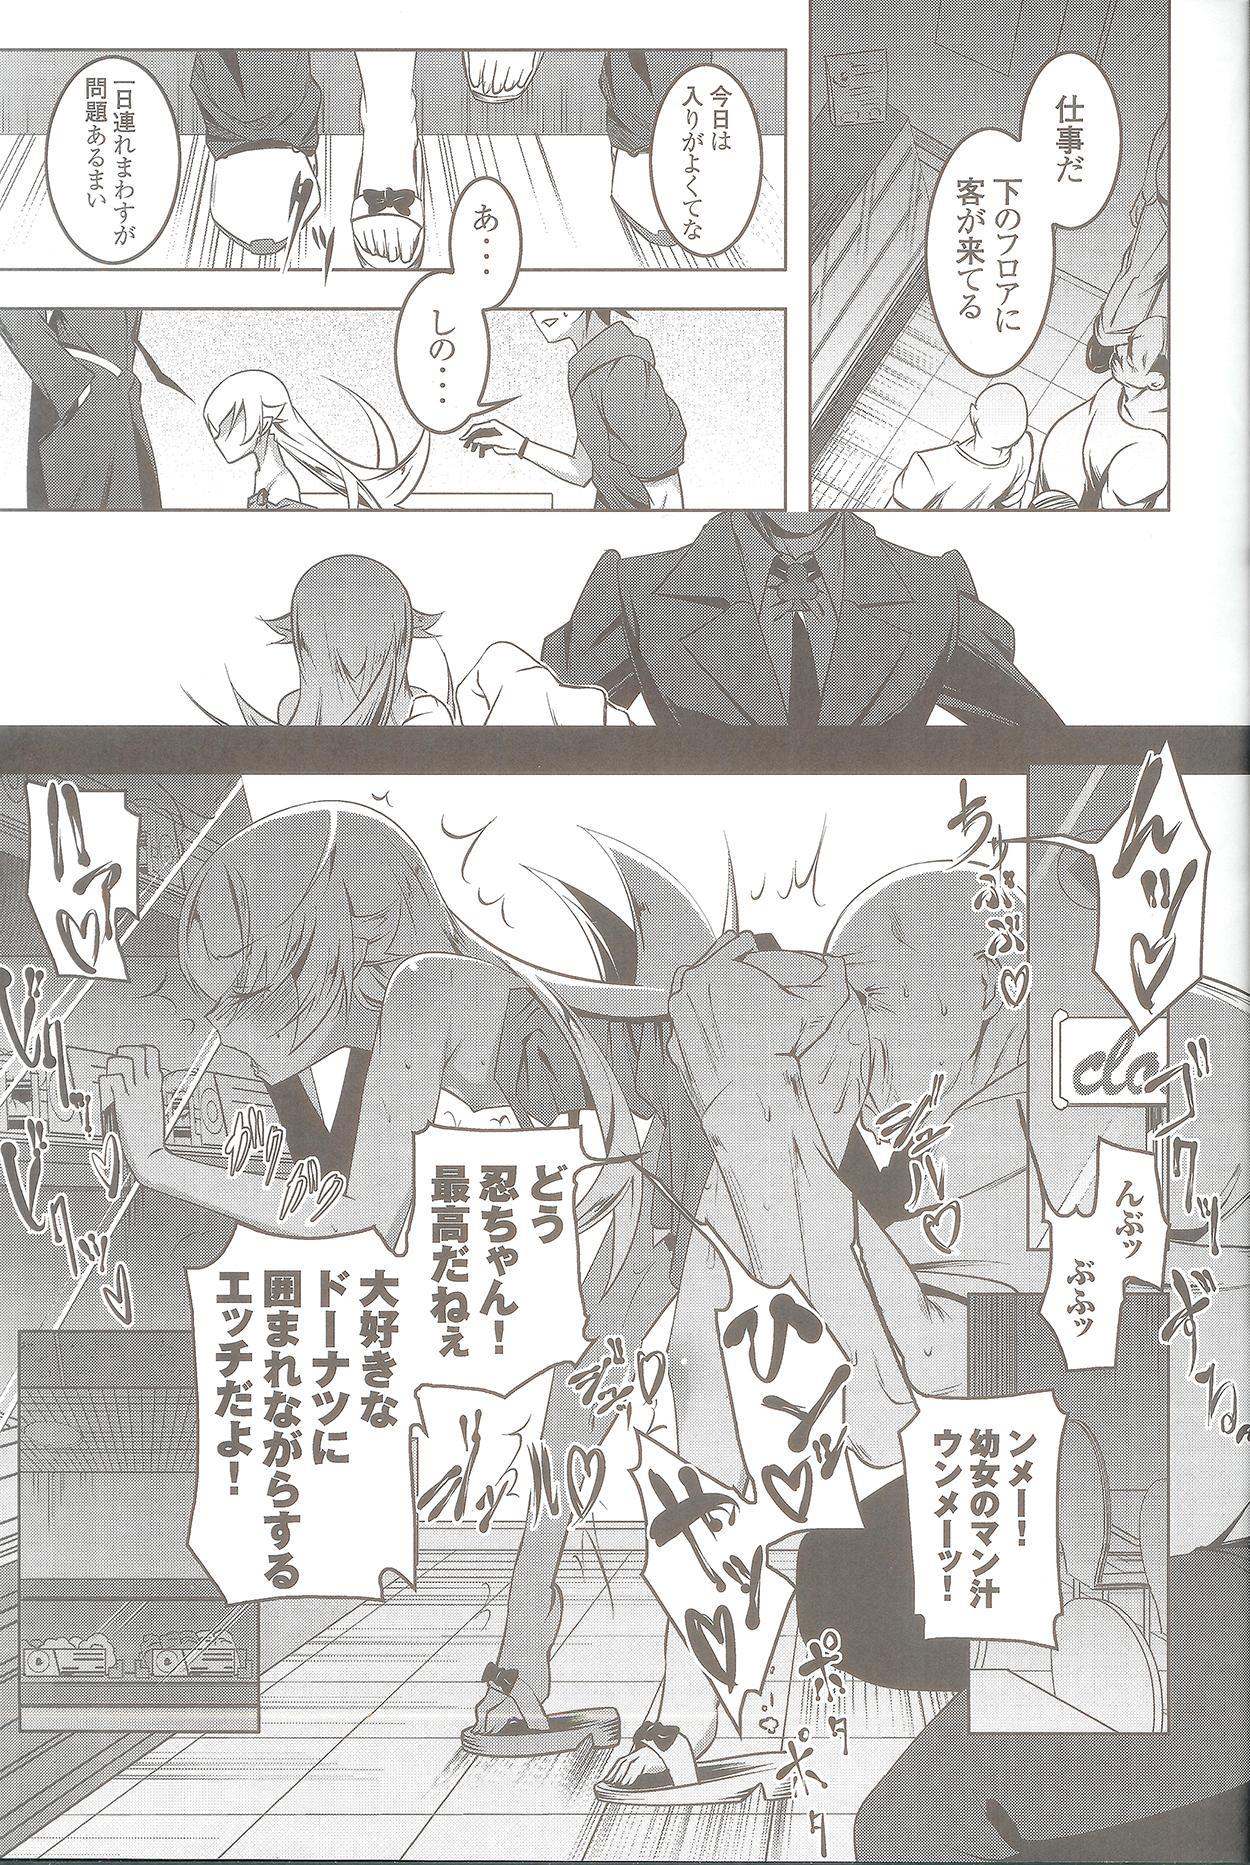 Netoraregatari San 8